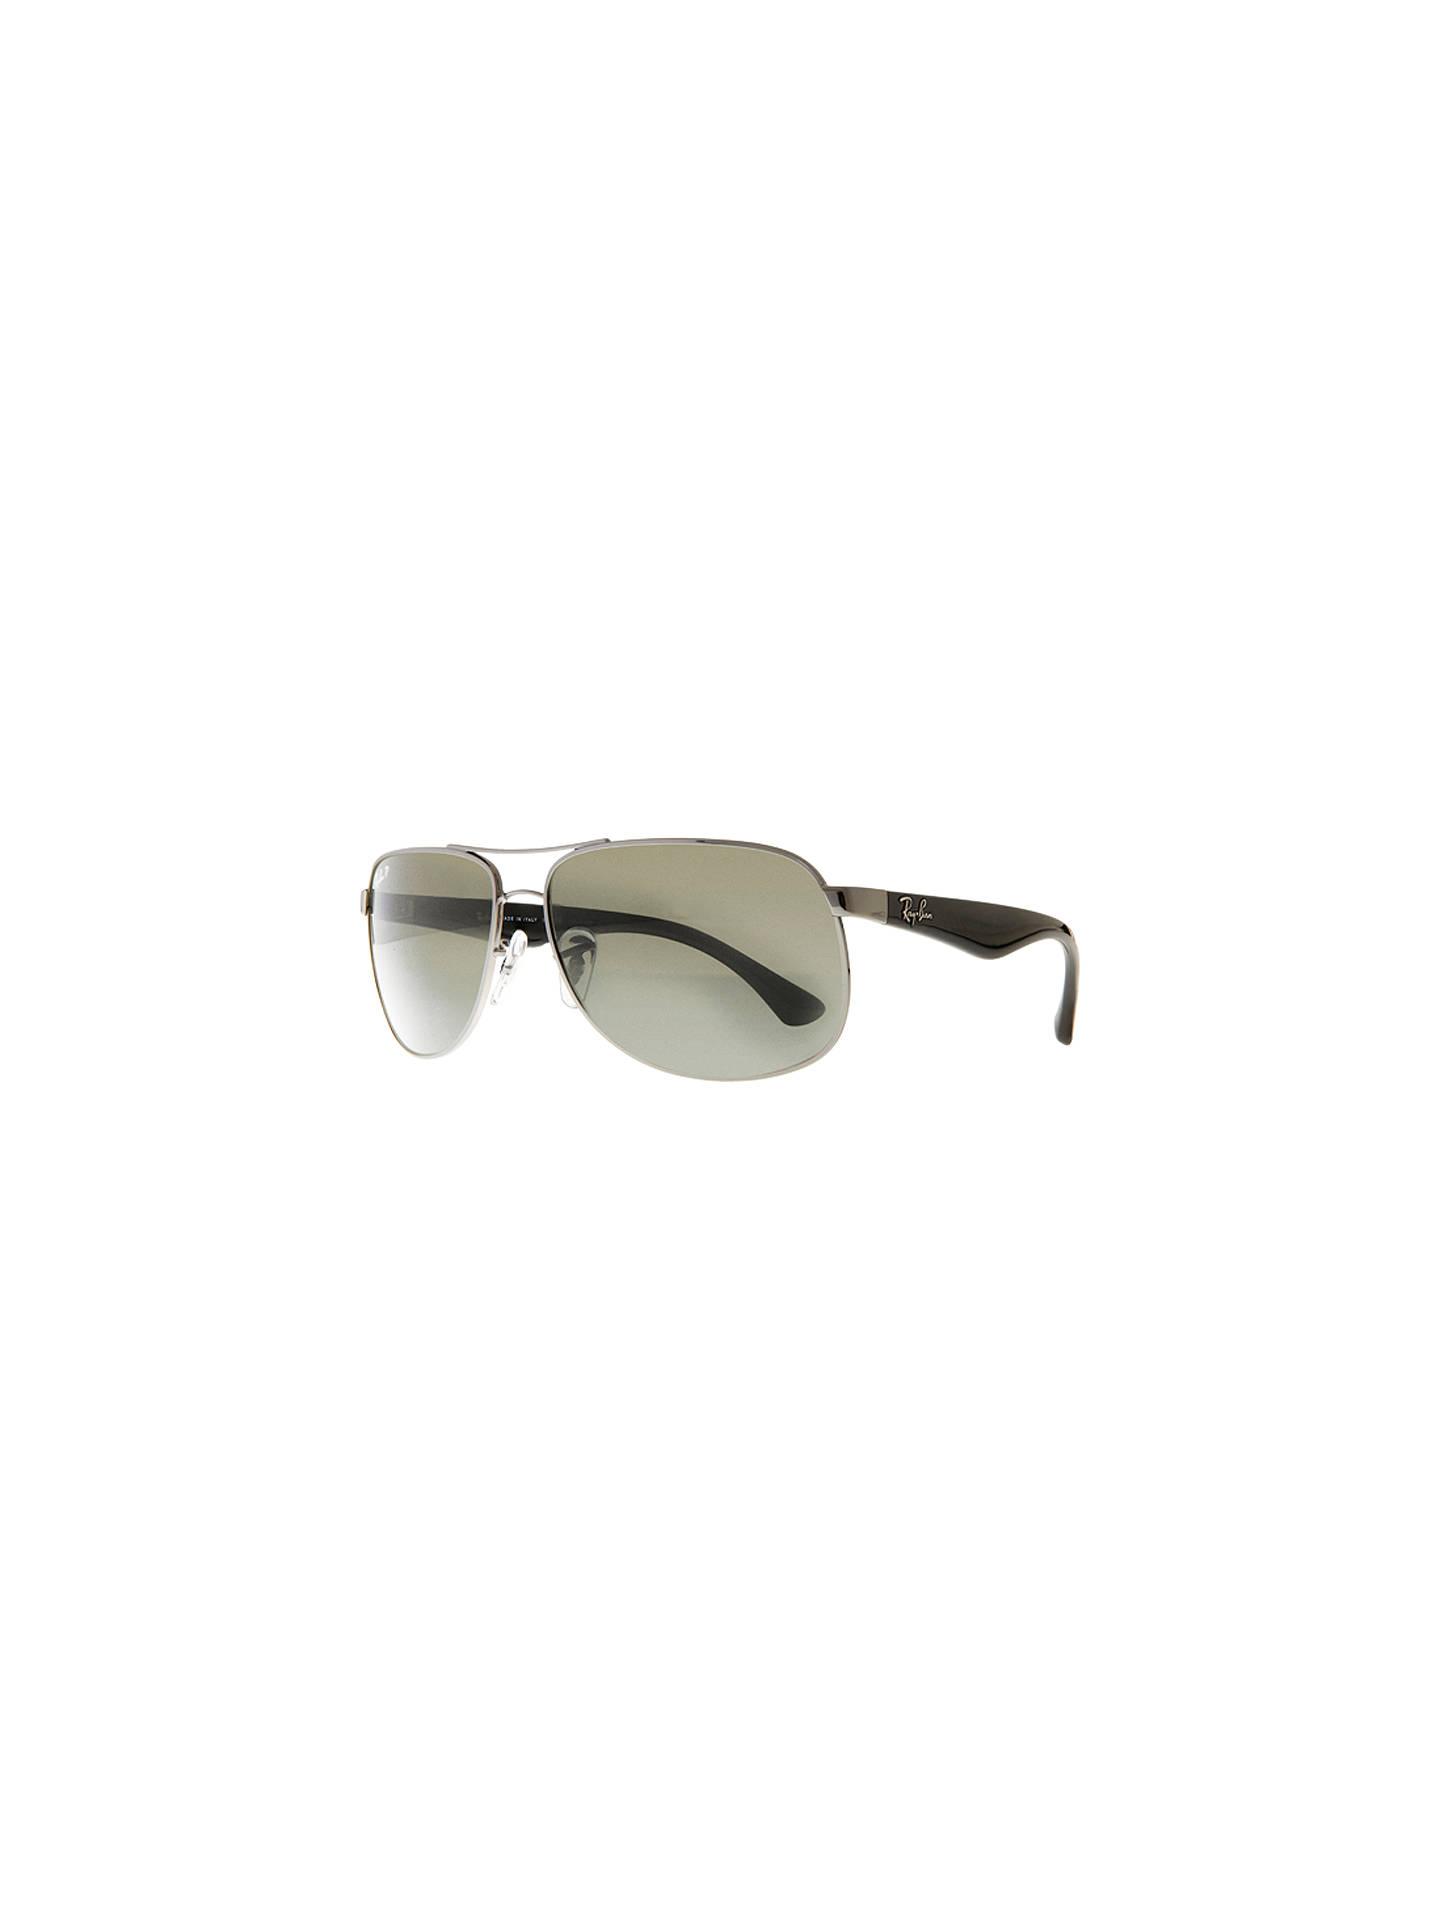 f5ed46569283b Ray-Ban RB3502 Polarised Active Lifestyle Aviator Sunglasses at John ...